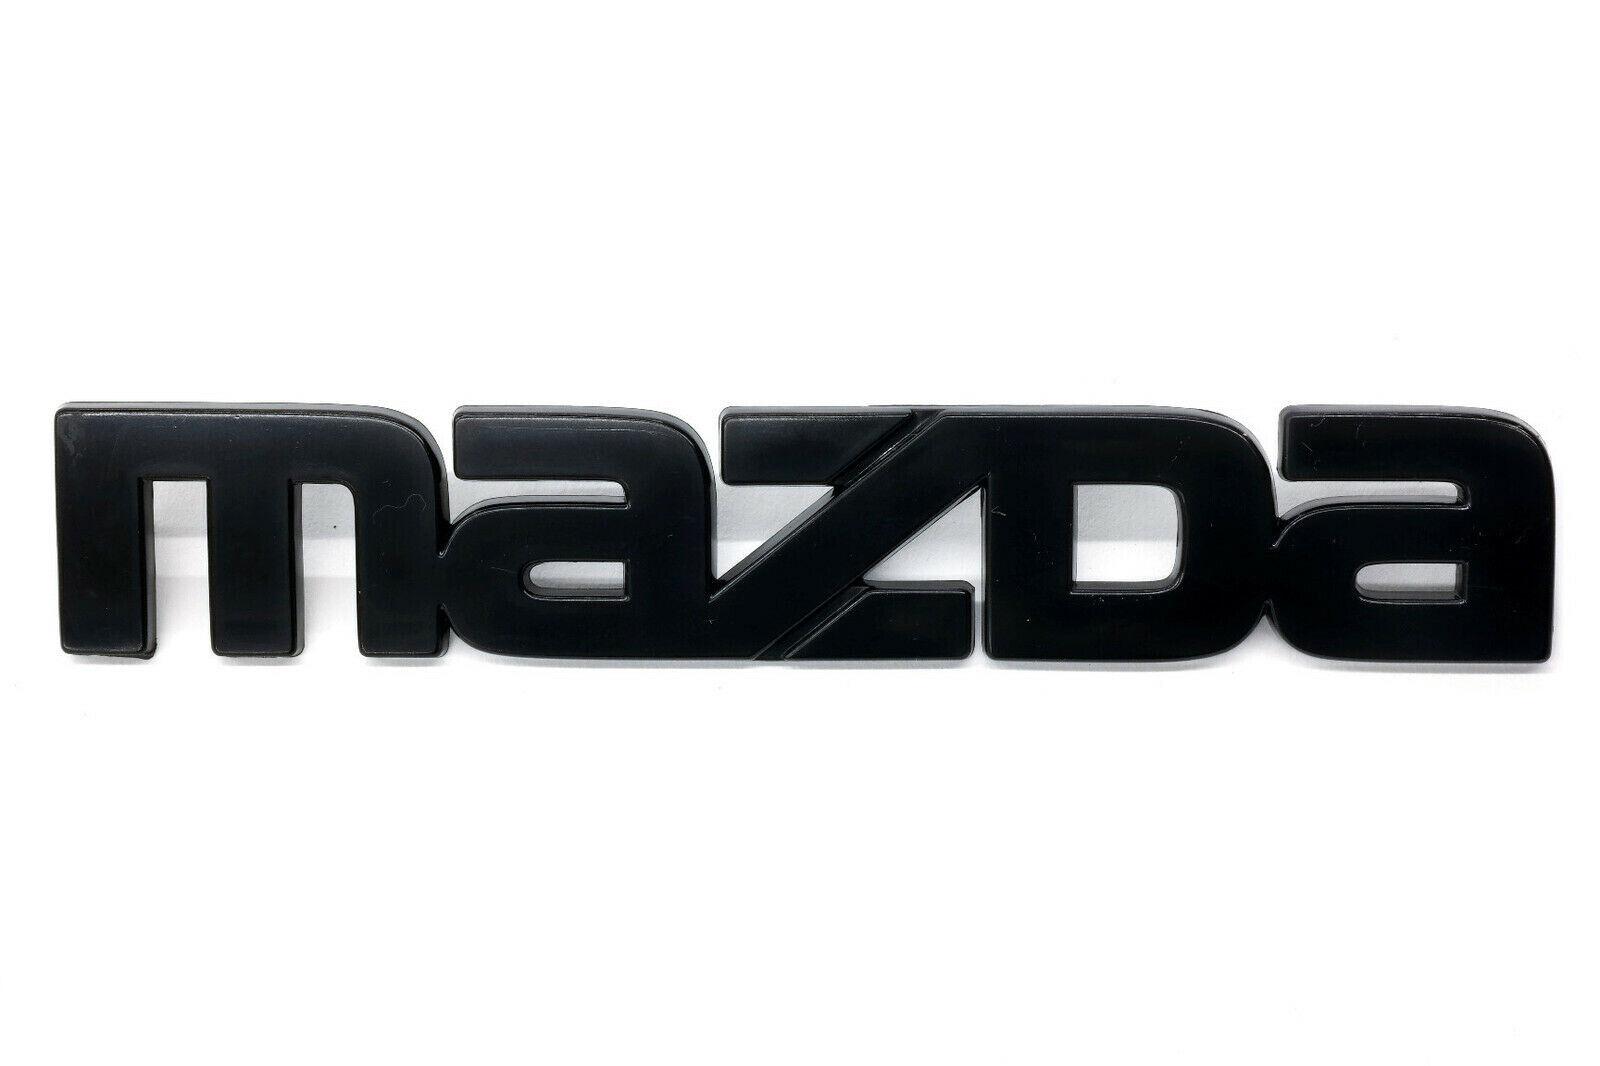 New OEM Mazda RX-7 1984-1985 Front Mazda Emblem Black F023-51-770A